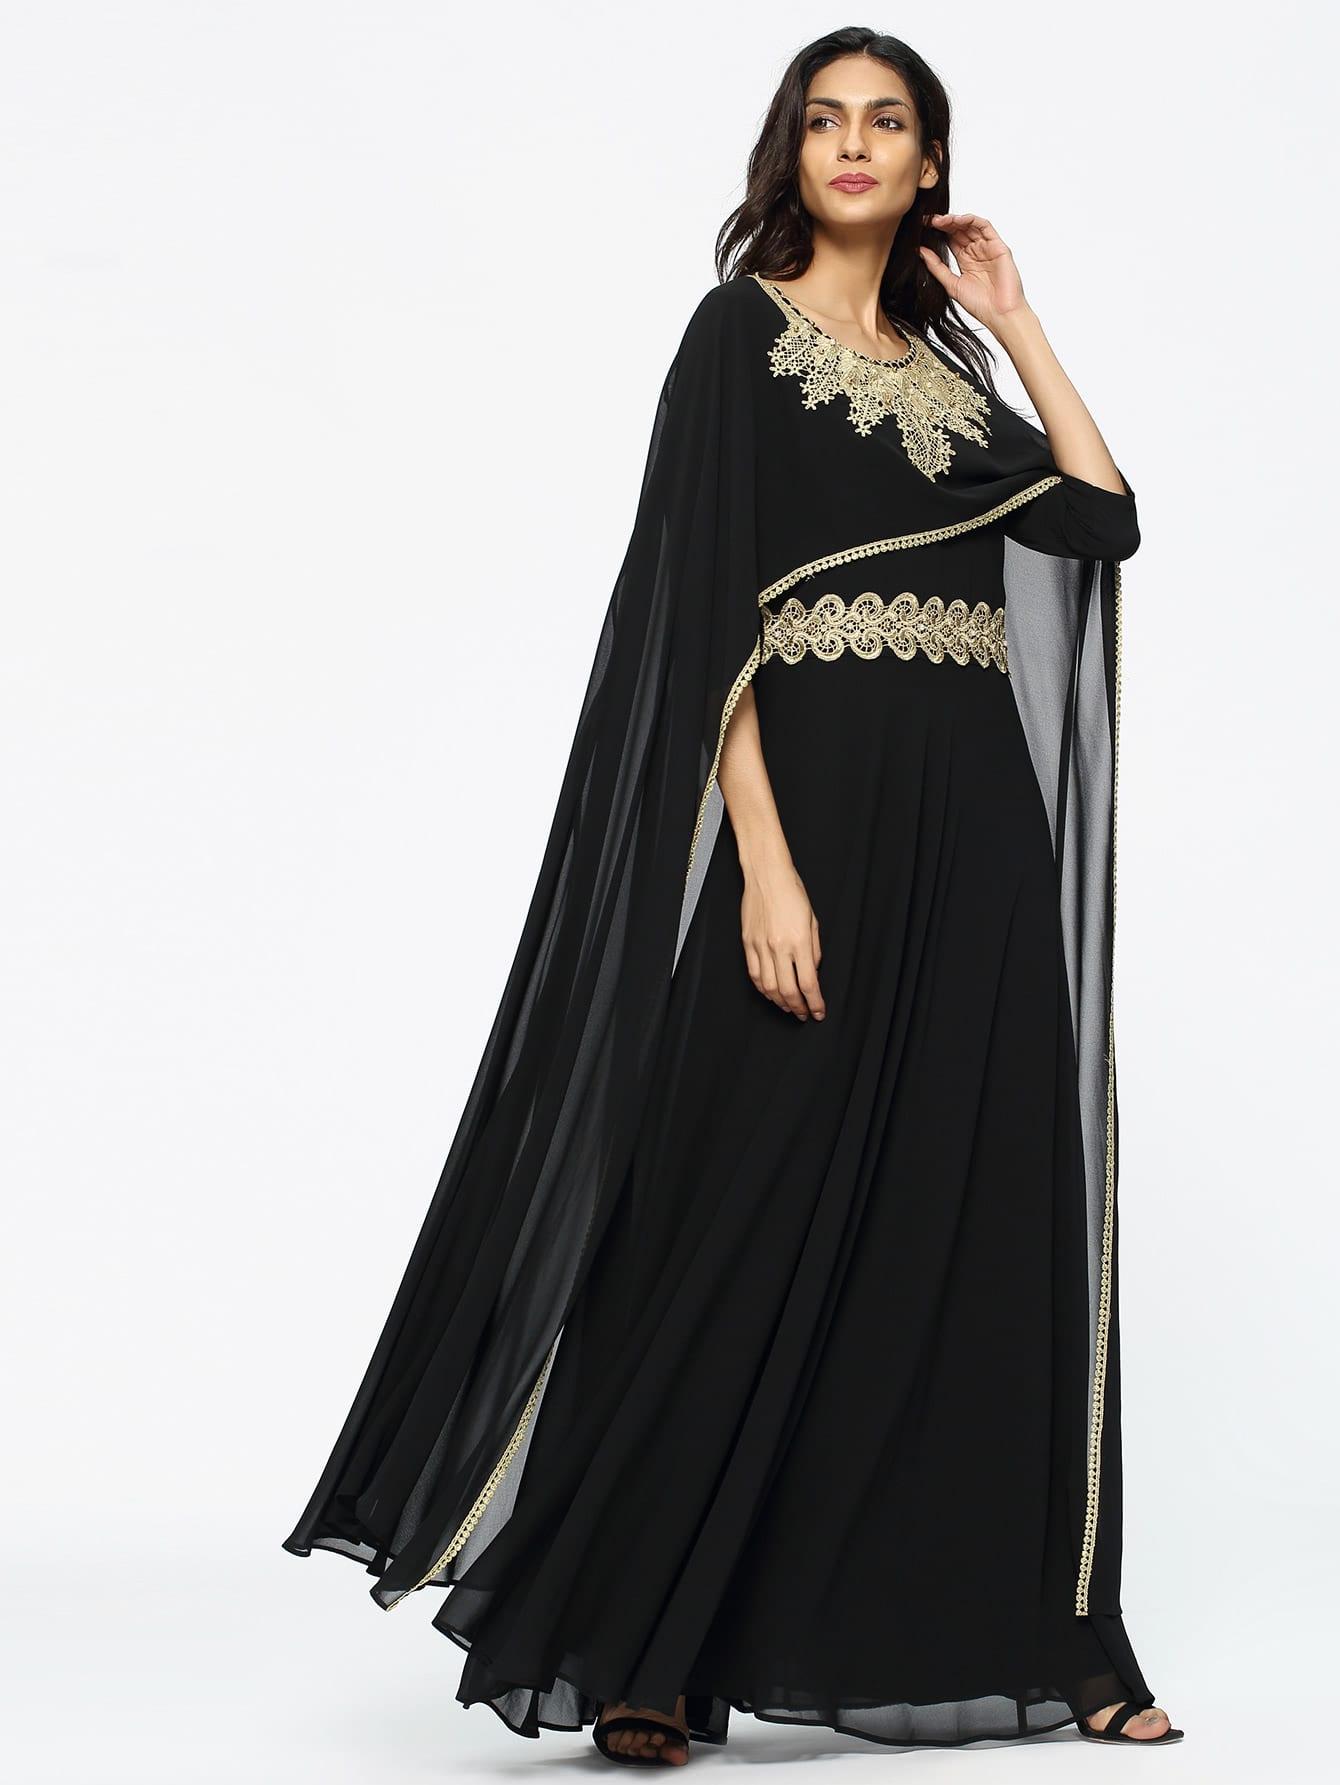 Фото Lace Crochet Appliques Sheer Cape Dress. Купить с доставкой